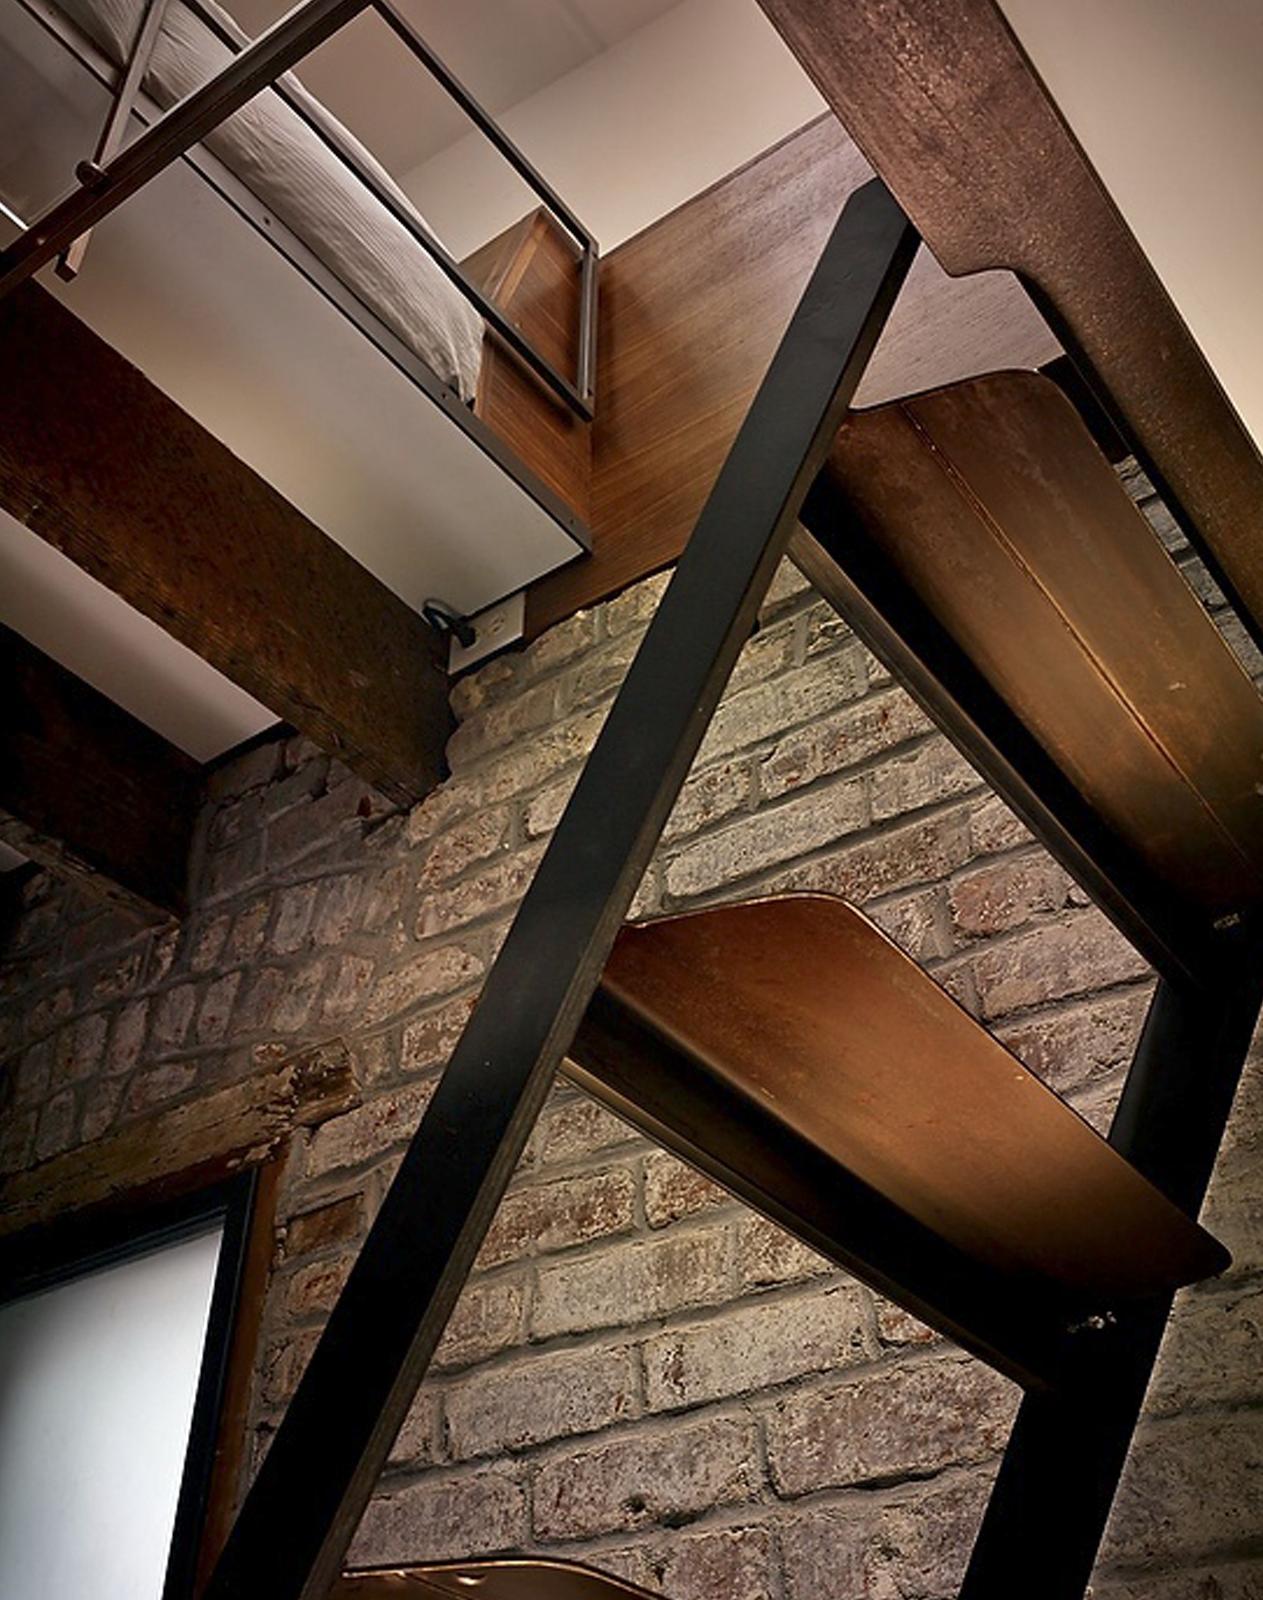 christi-azevedo-interiorismo-casa-4